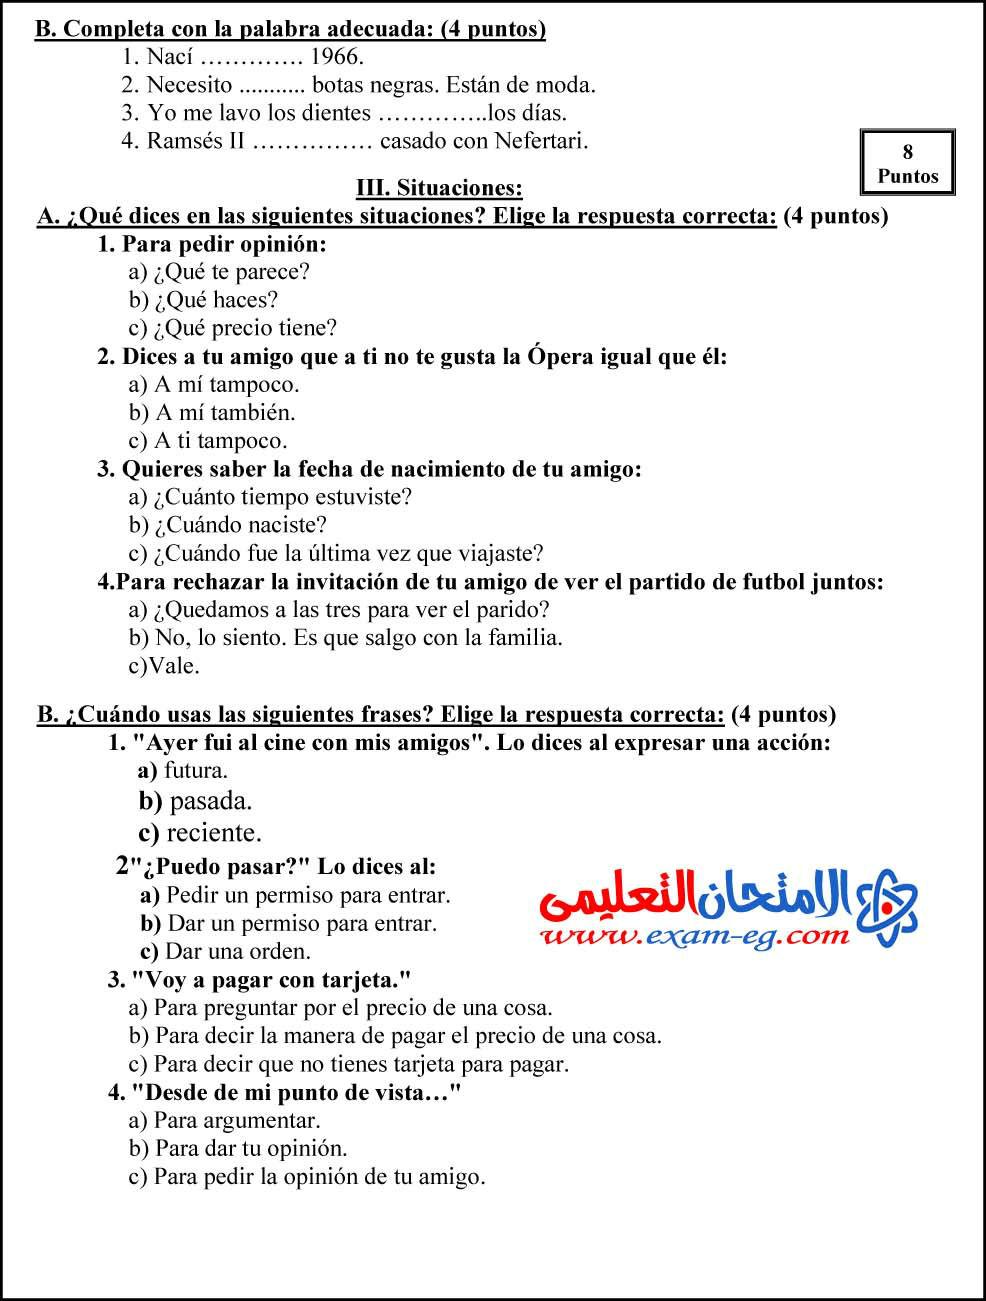 exam-eg.com_1396622191282.jpg